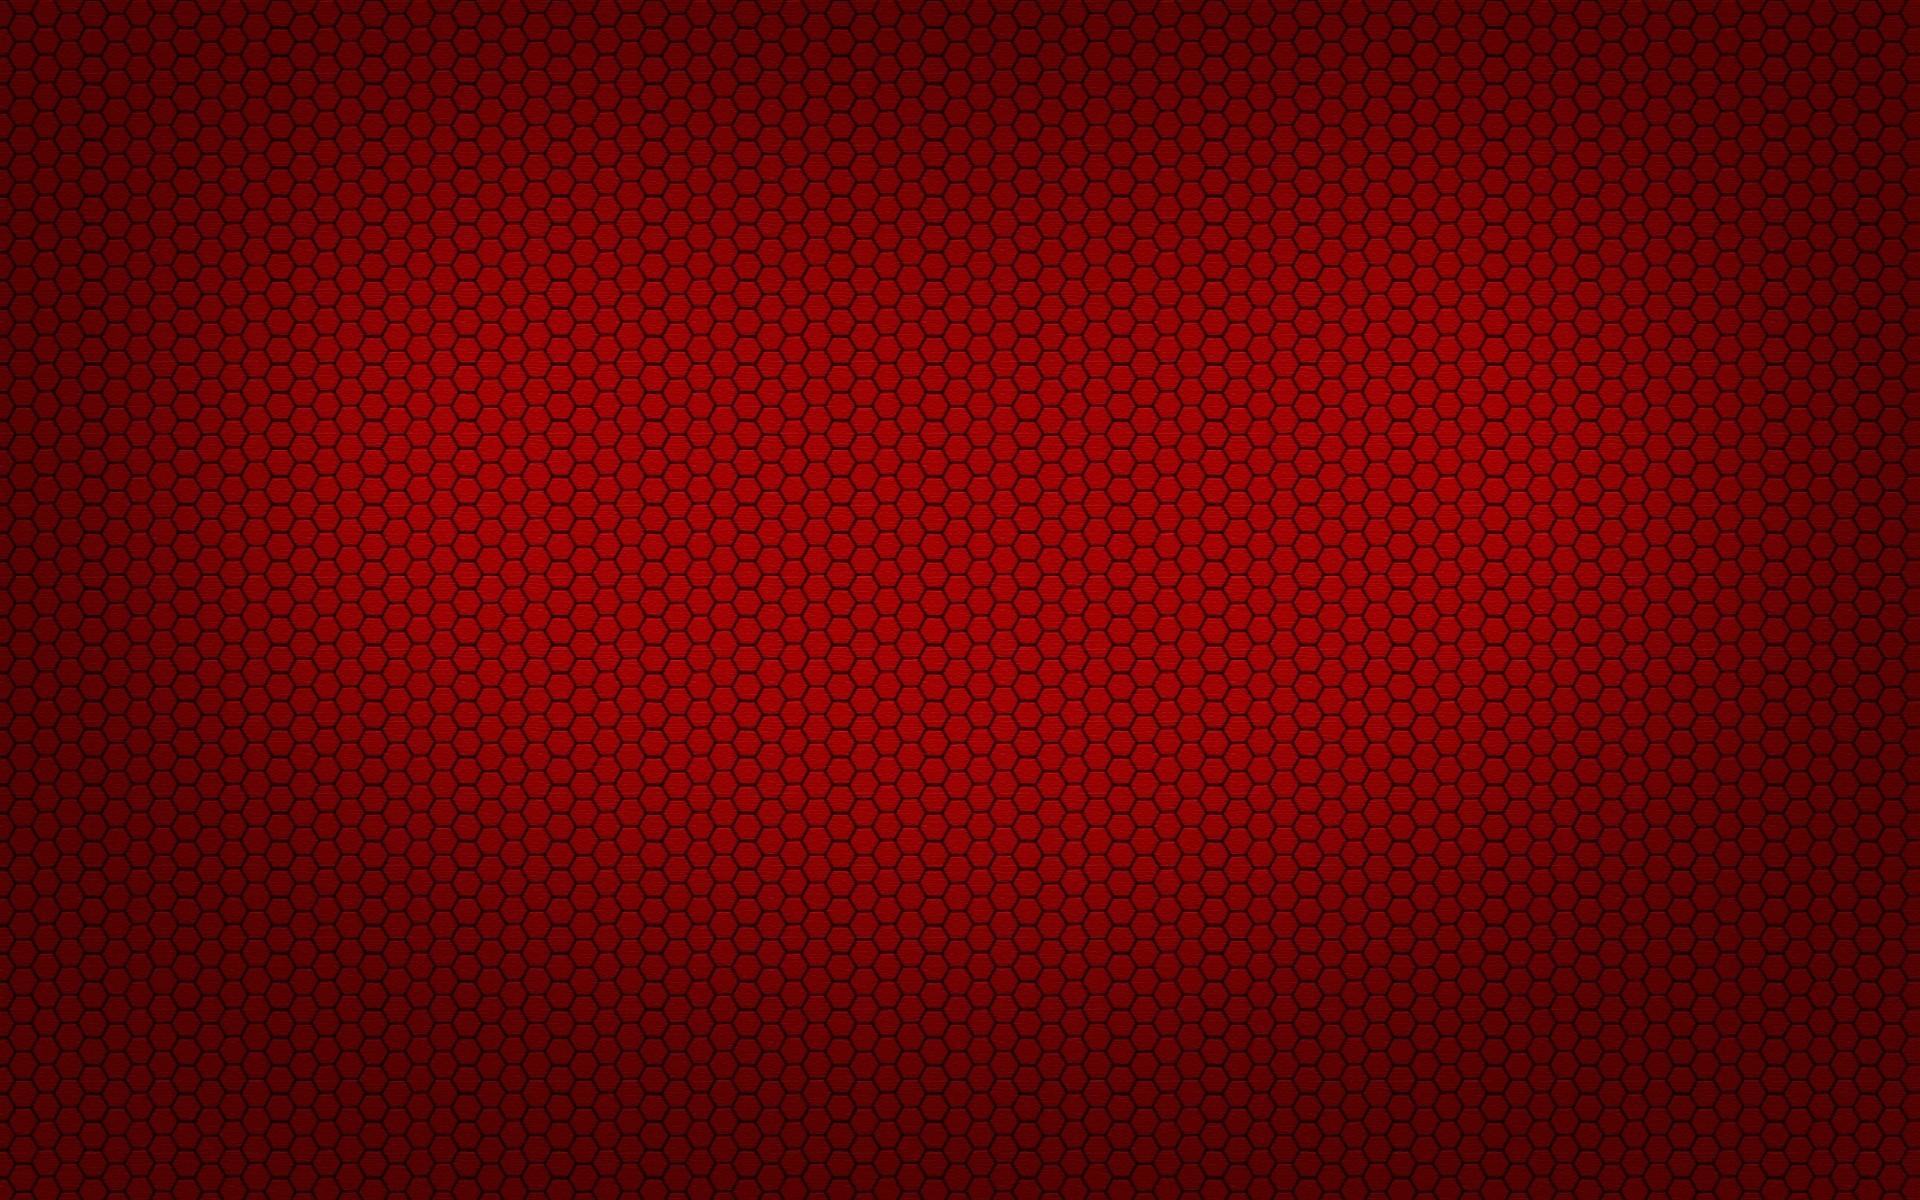 Dark Red Background Wallpaper (66+ images)